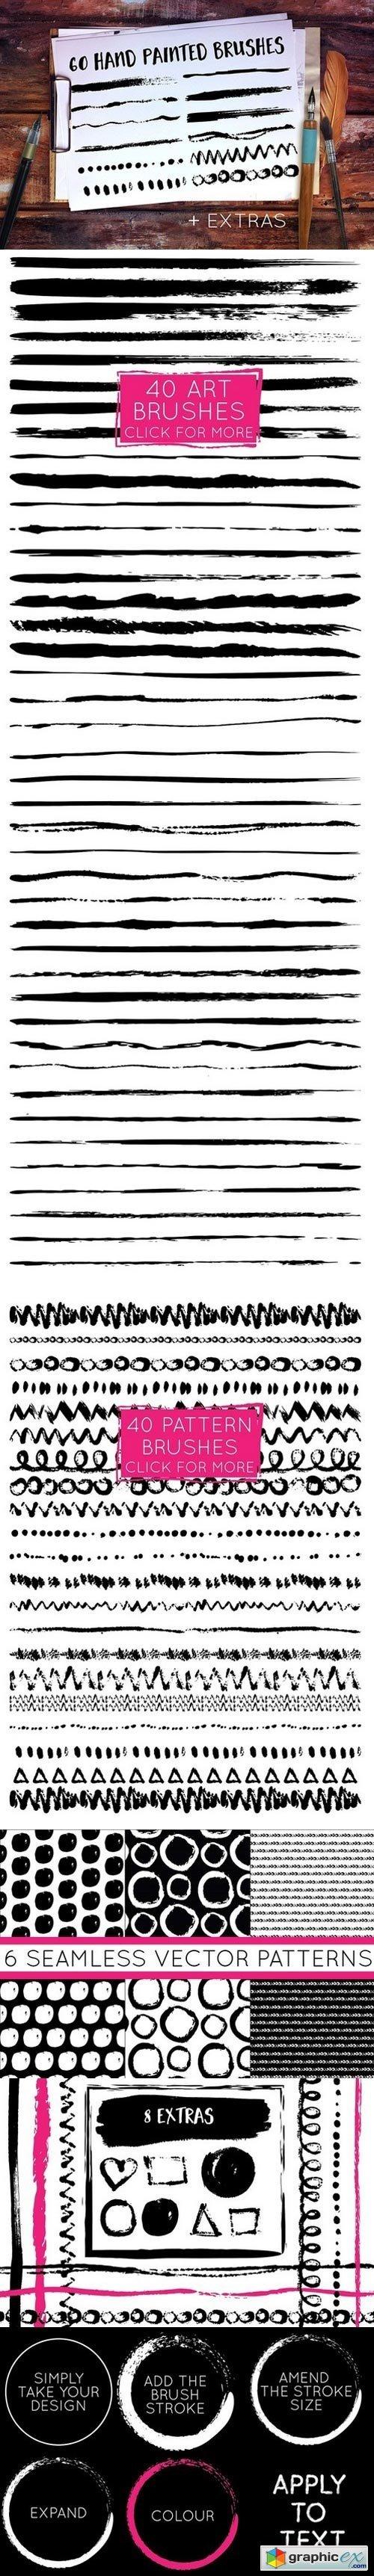 Handpainted Brush Stroke Brushes » Free Download Vector